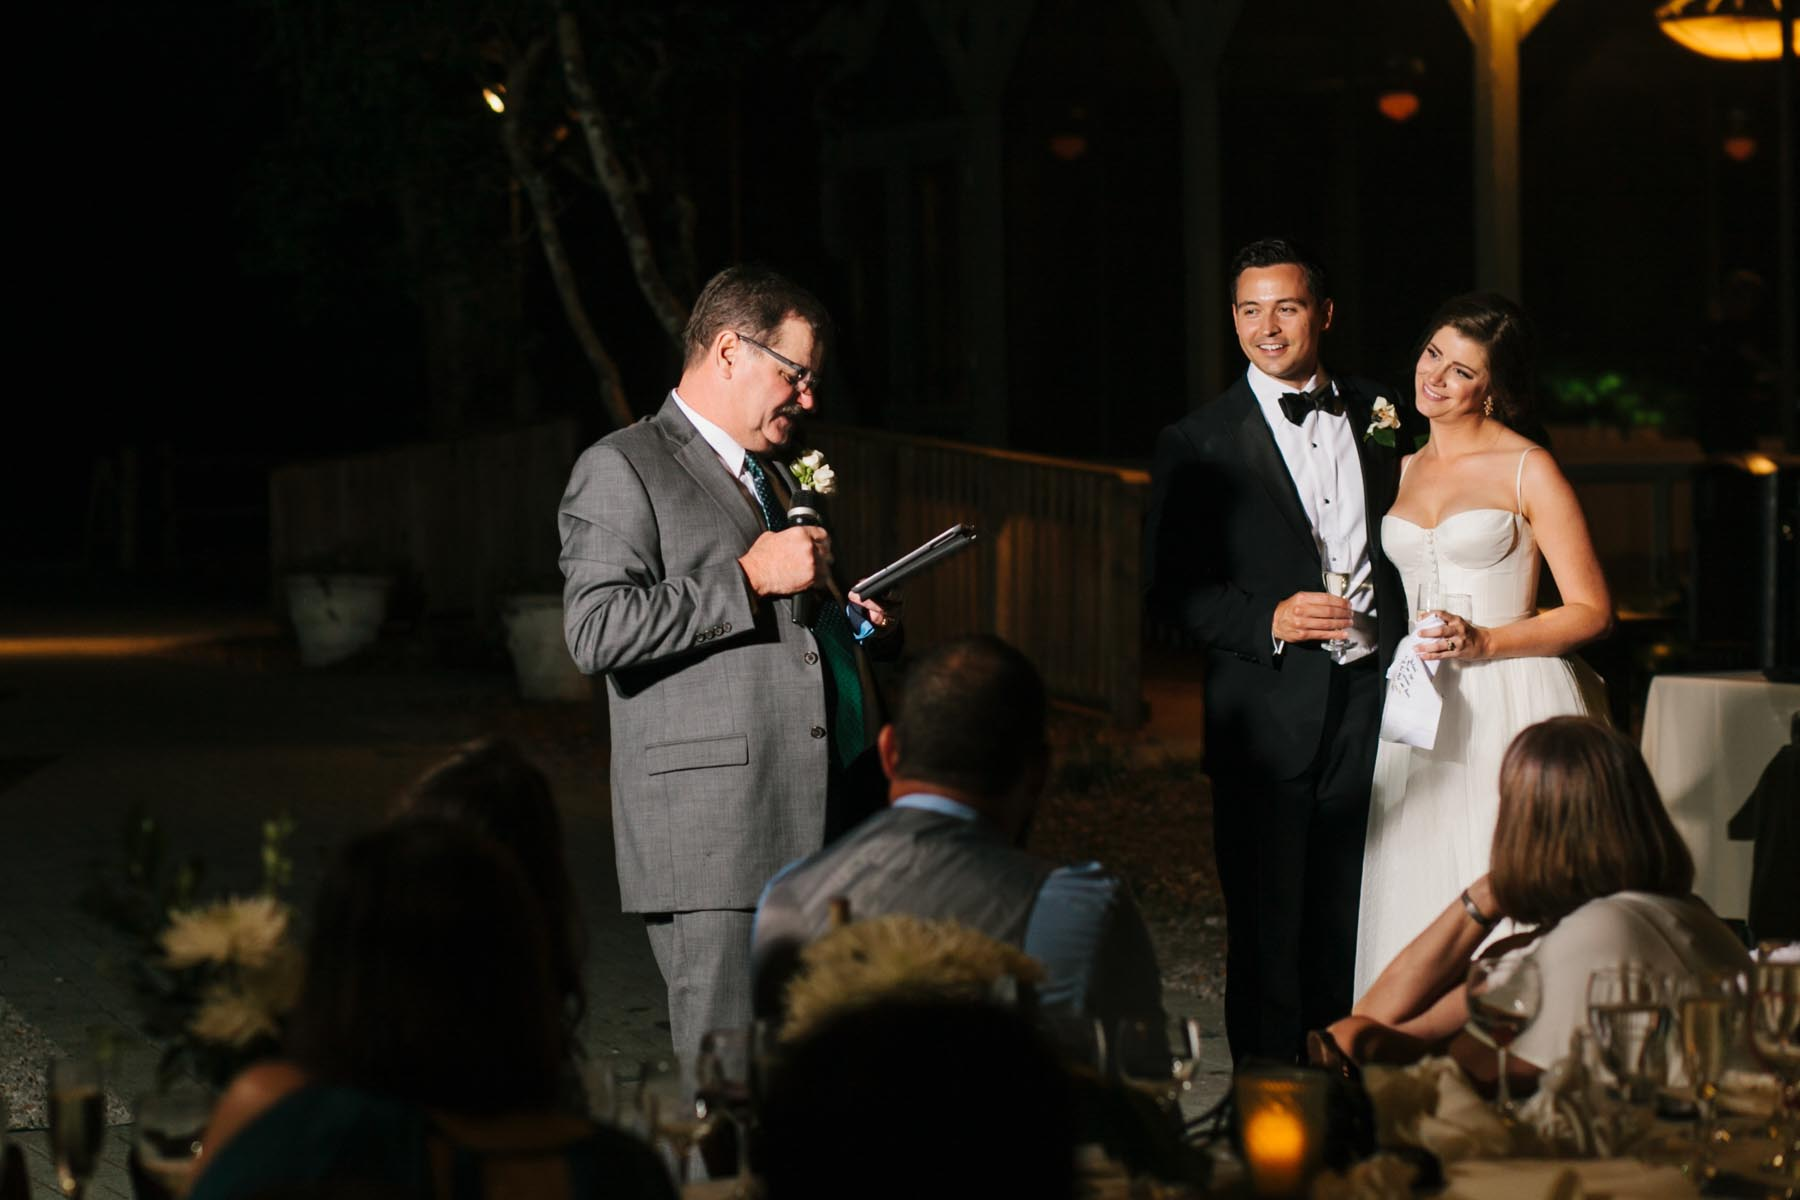 lowry wedding blog eden garden florida wedding-135